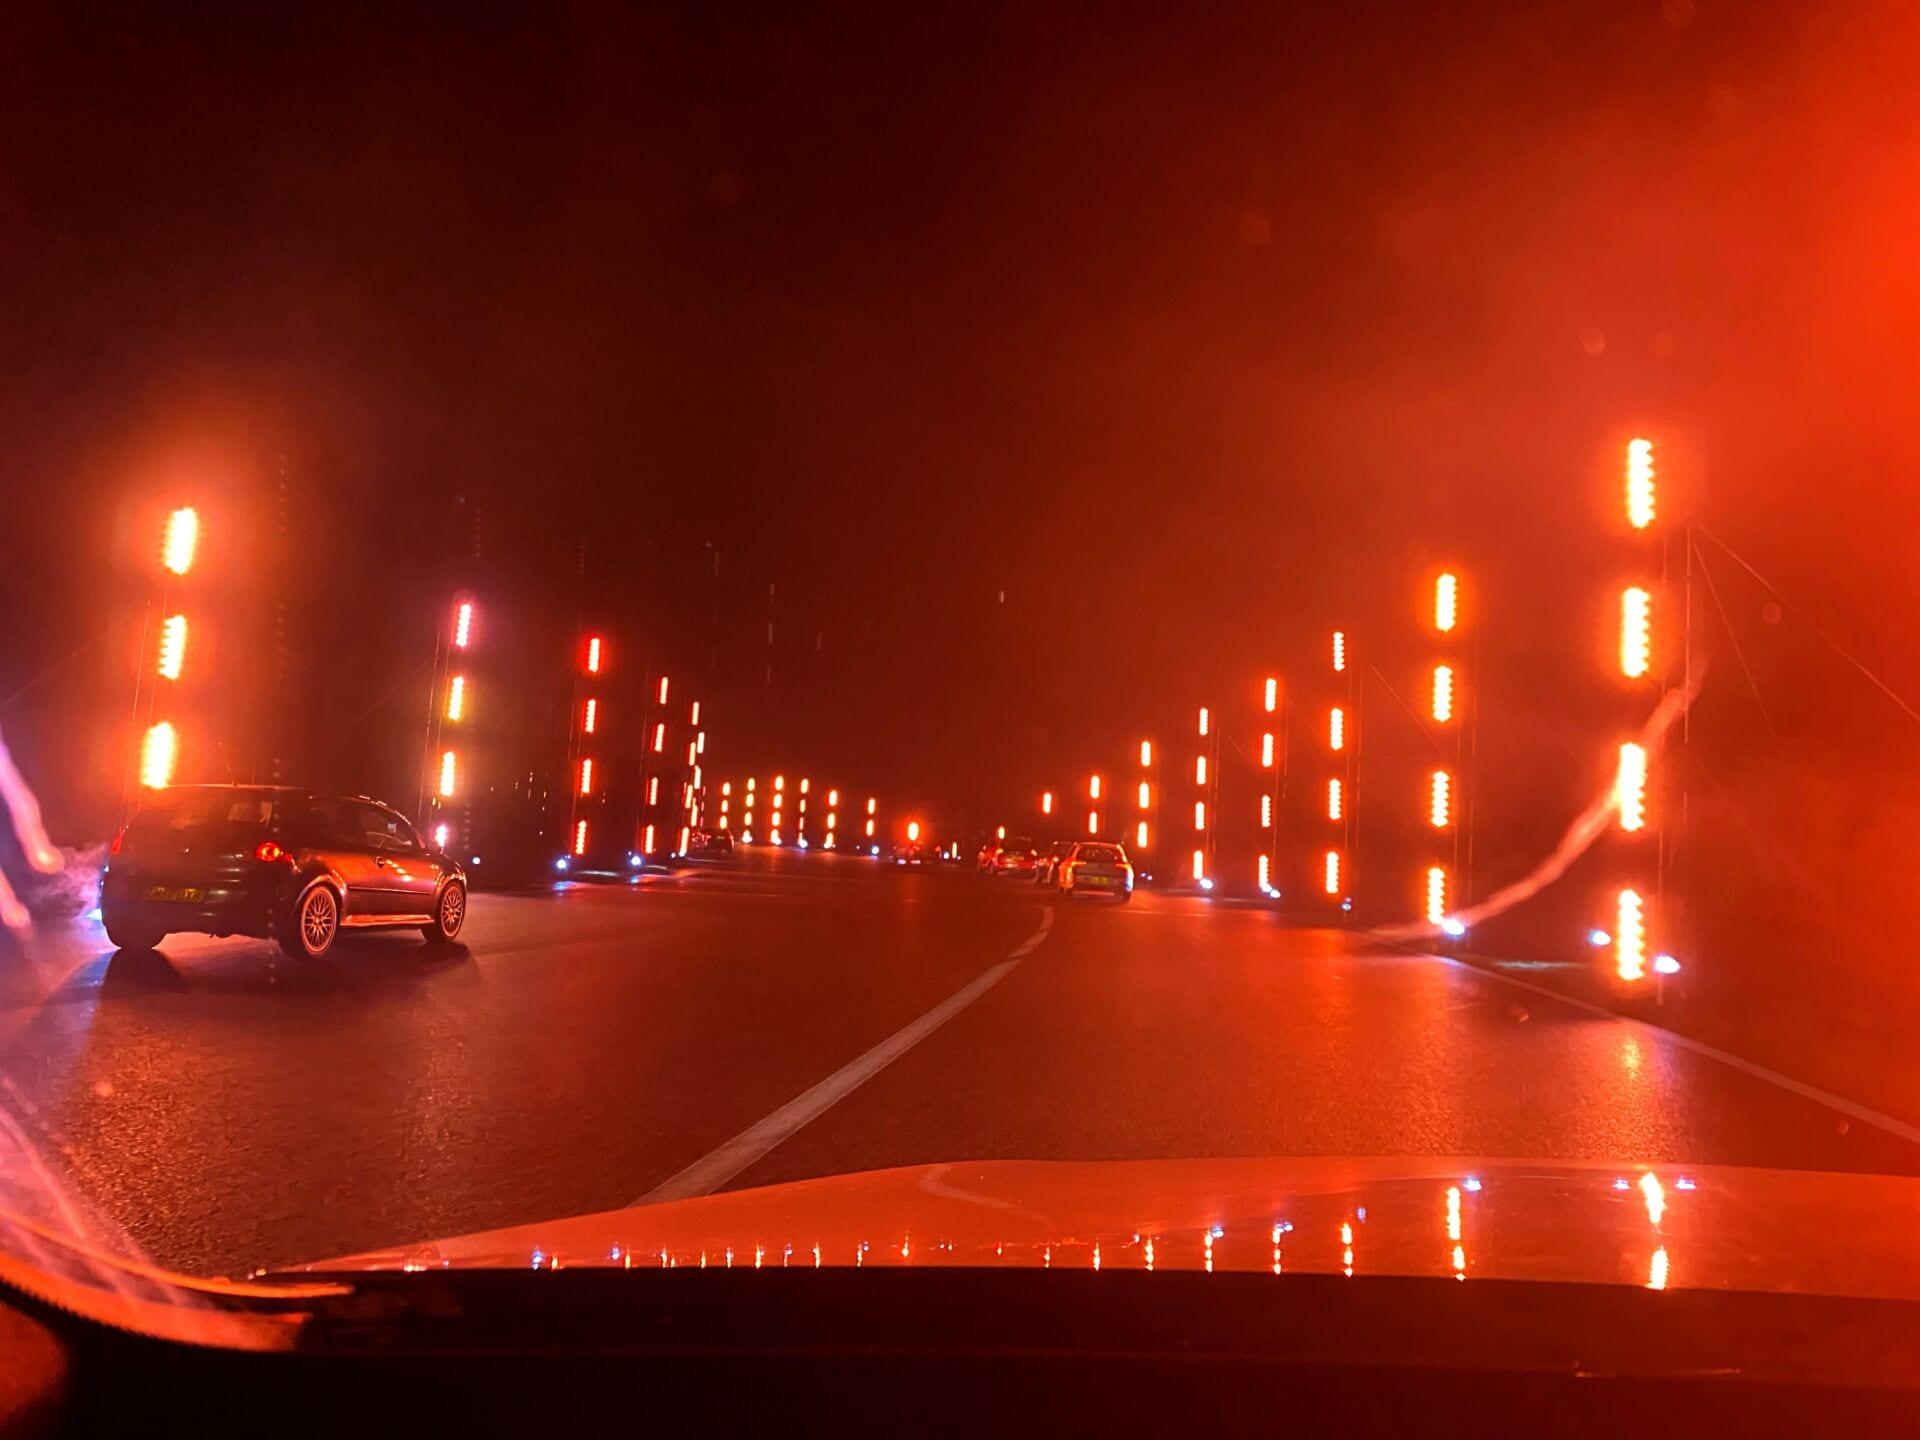 Lighting Lapland Silverstone